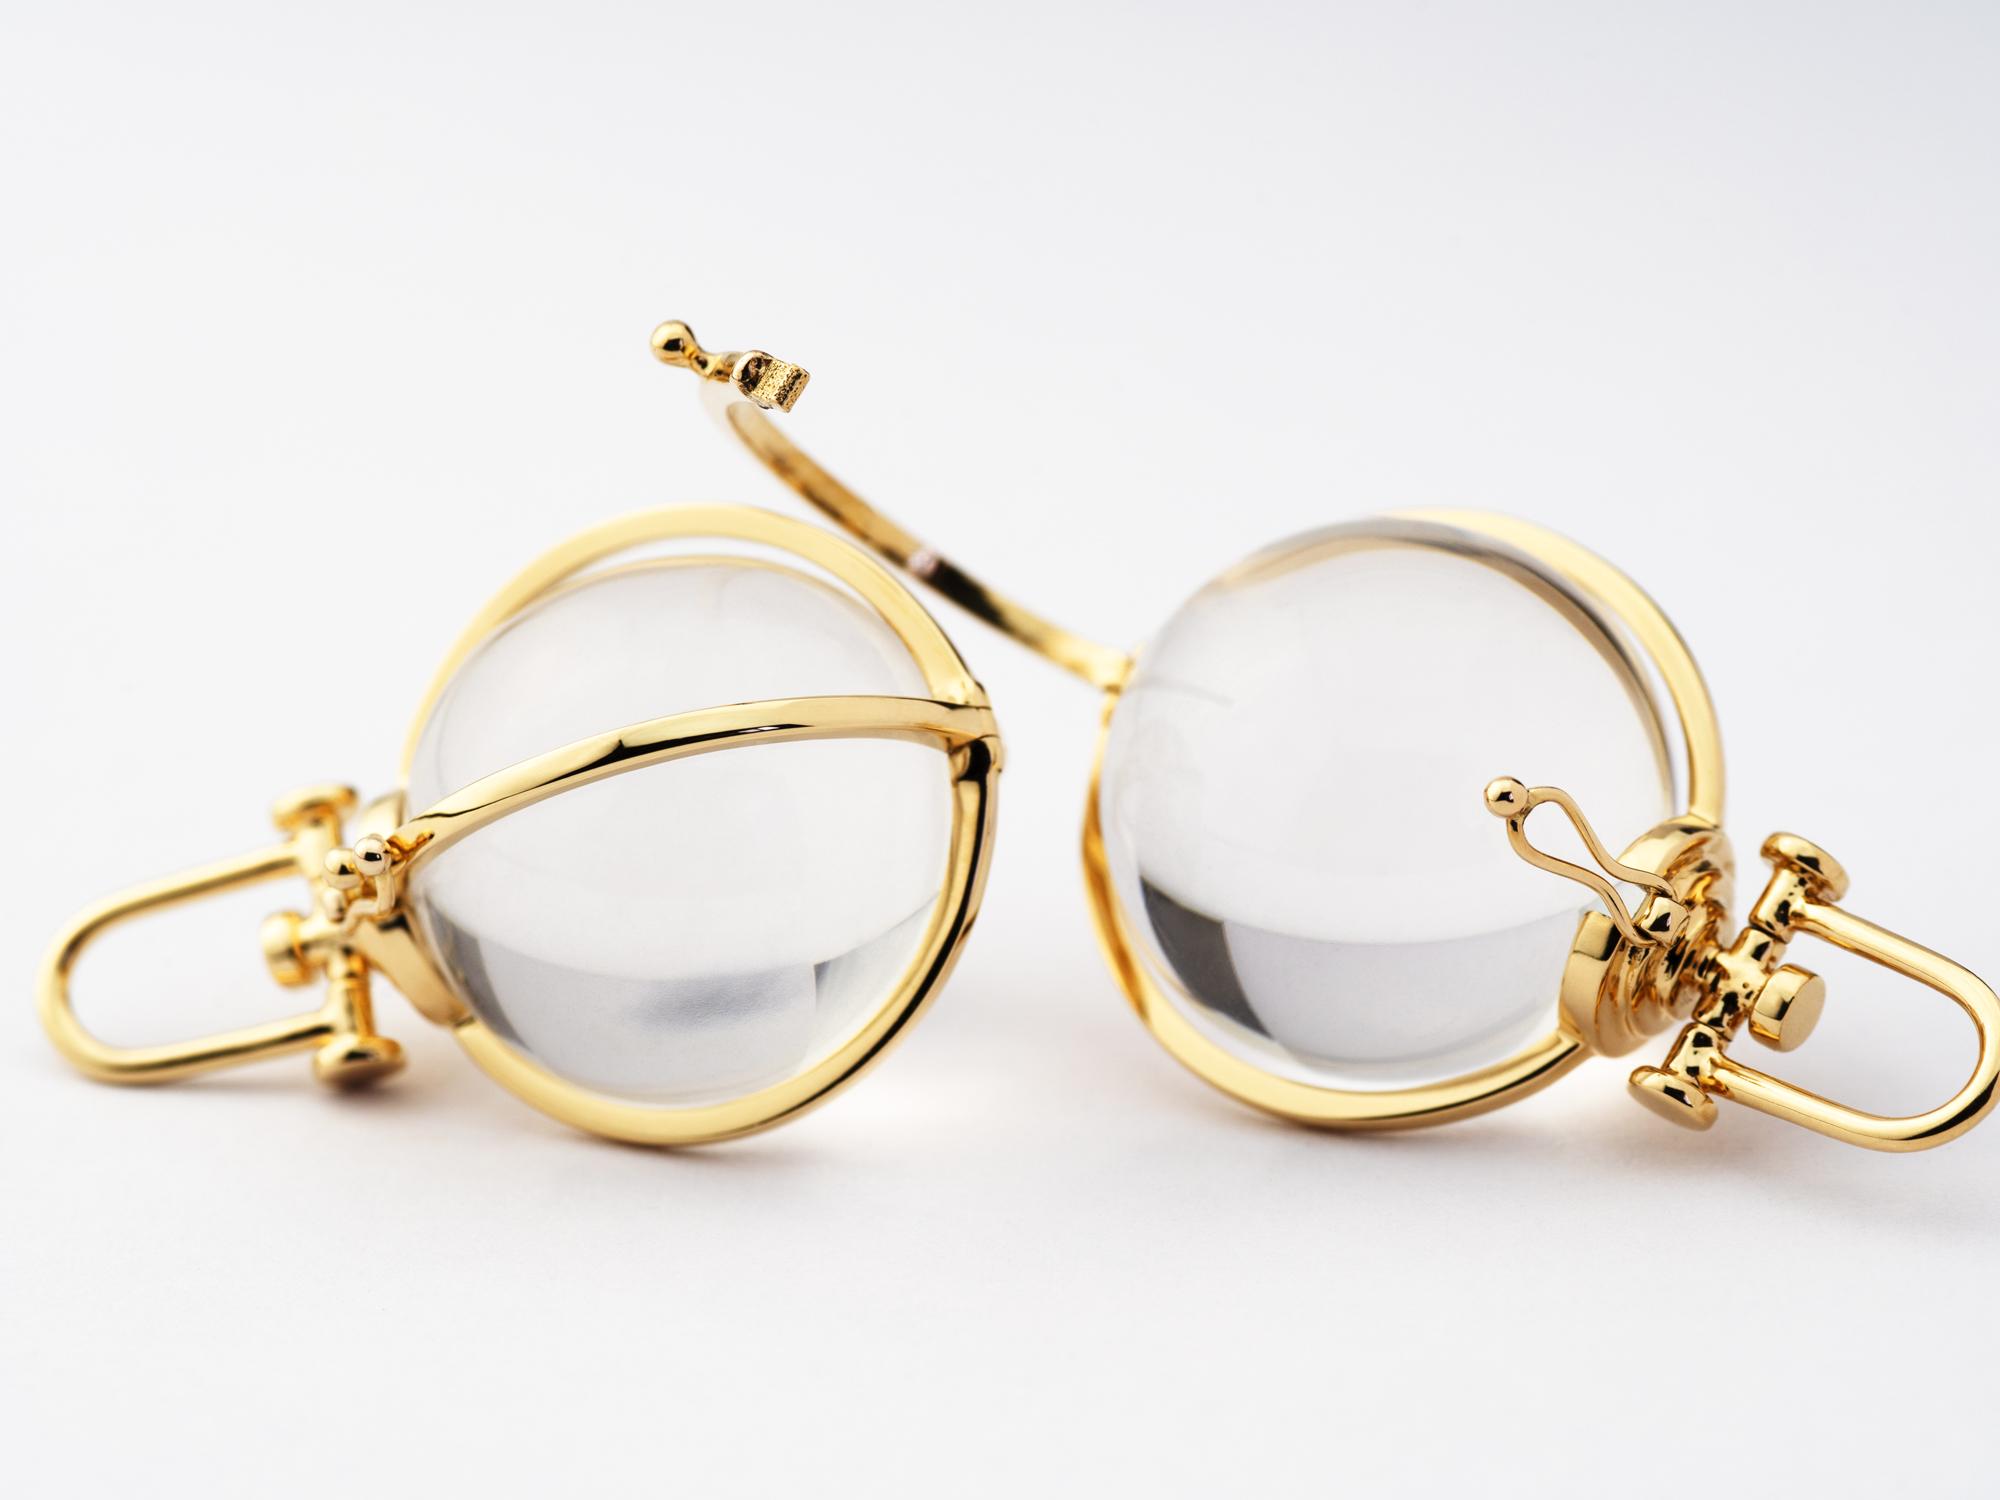 Rebecca Li Signature Crystal Orb Talisman Pendant Necklace, Large, 18k Solid Yellow Gold, Natural Rock Crystal